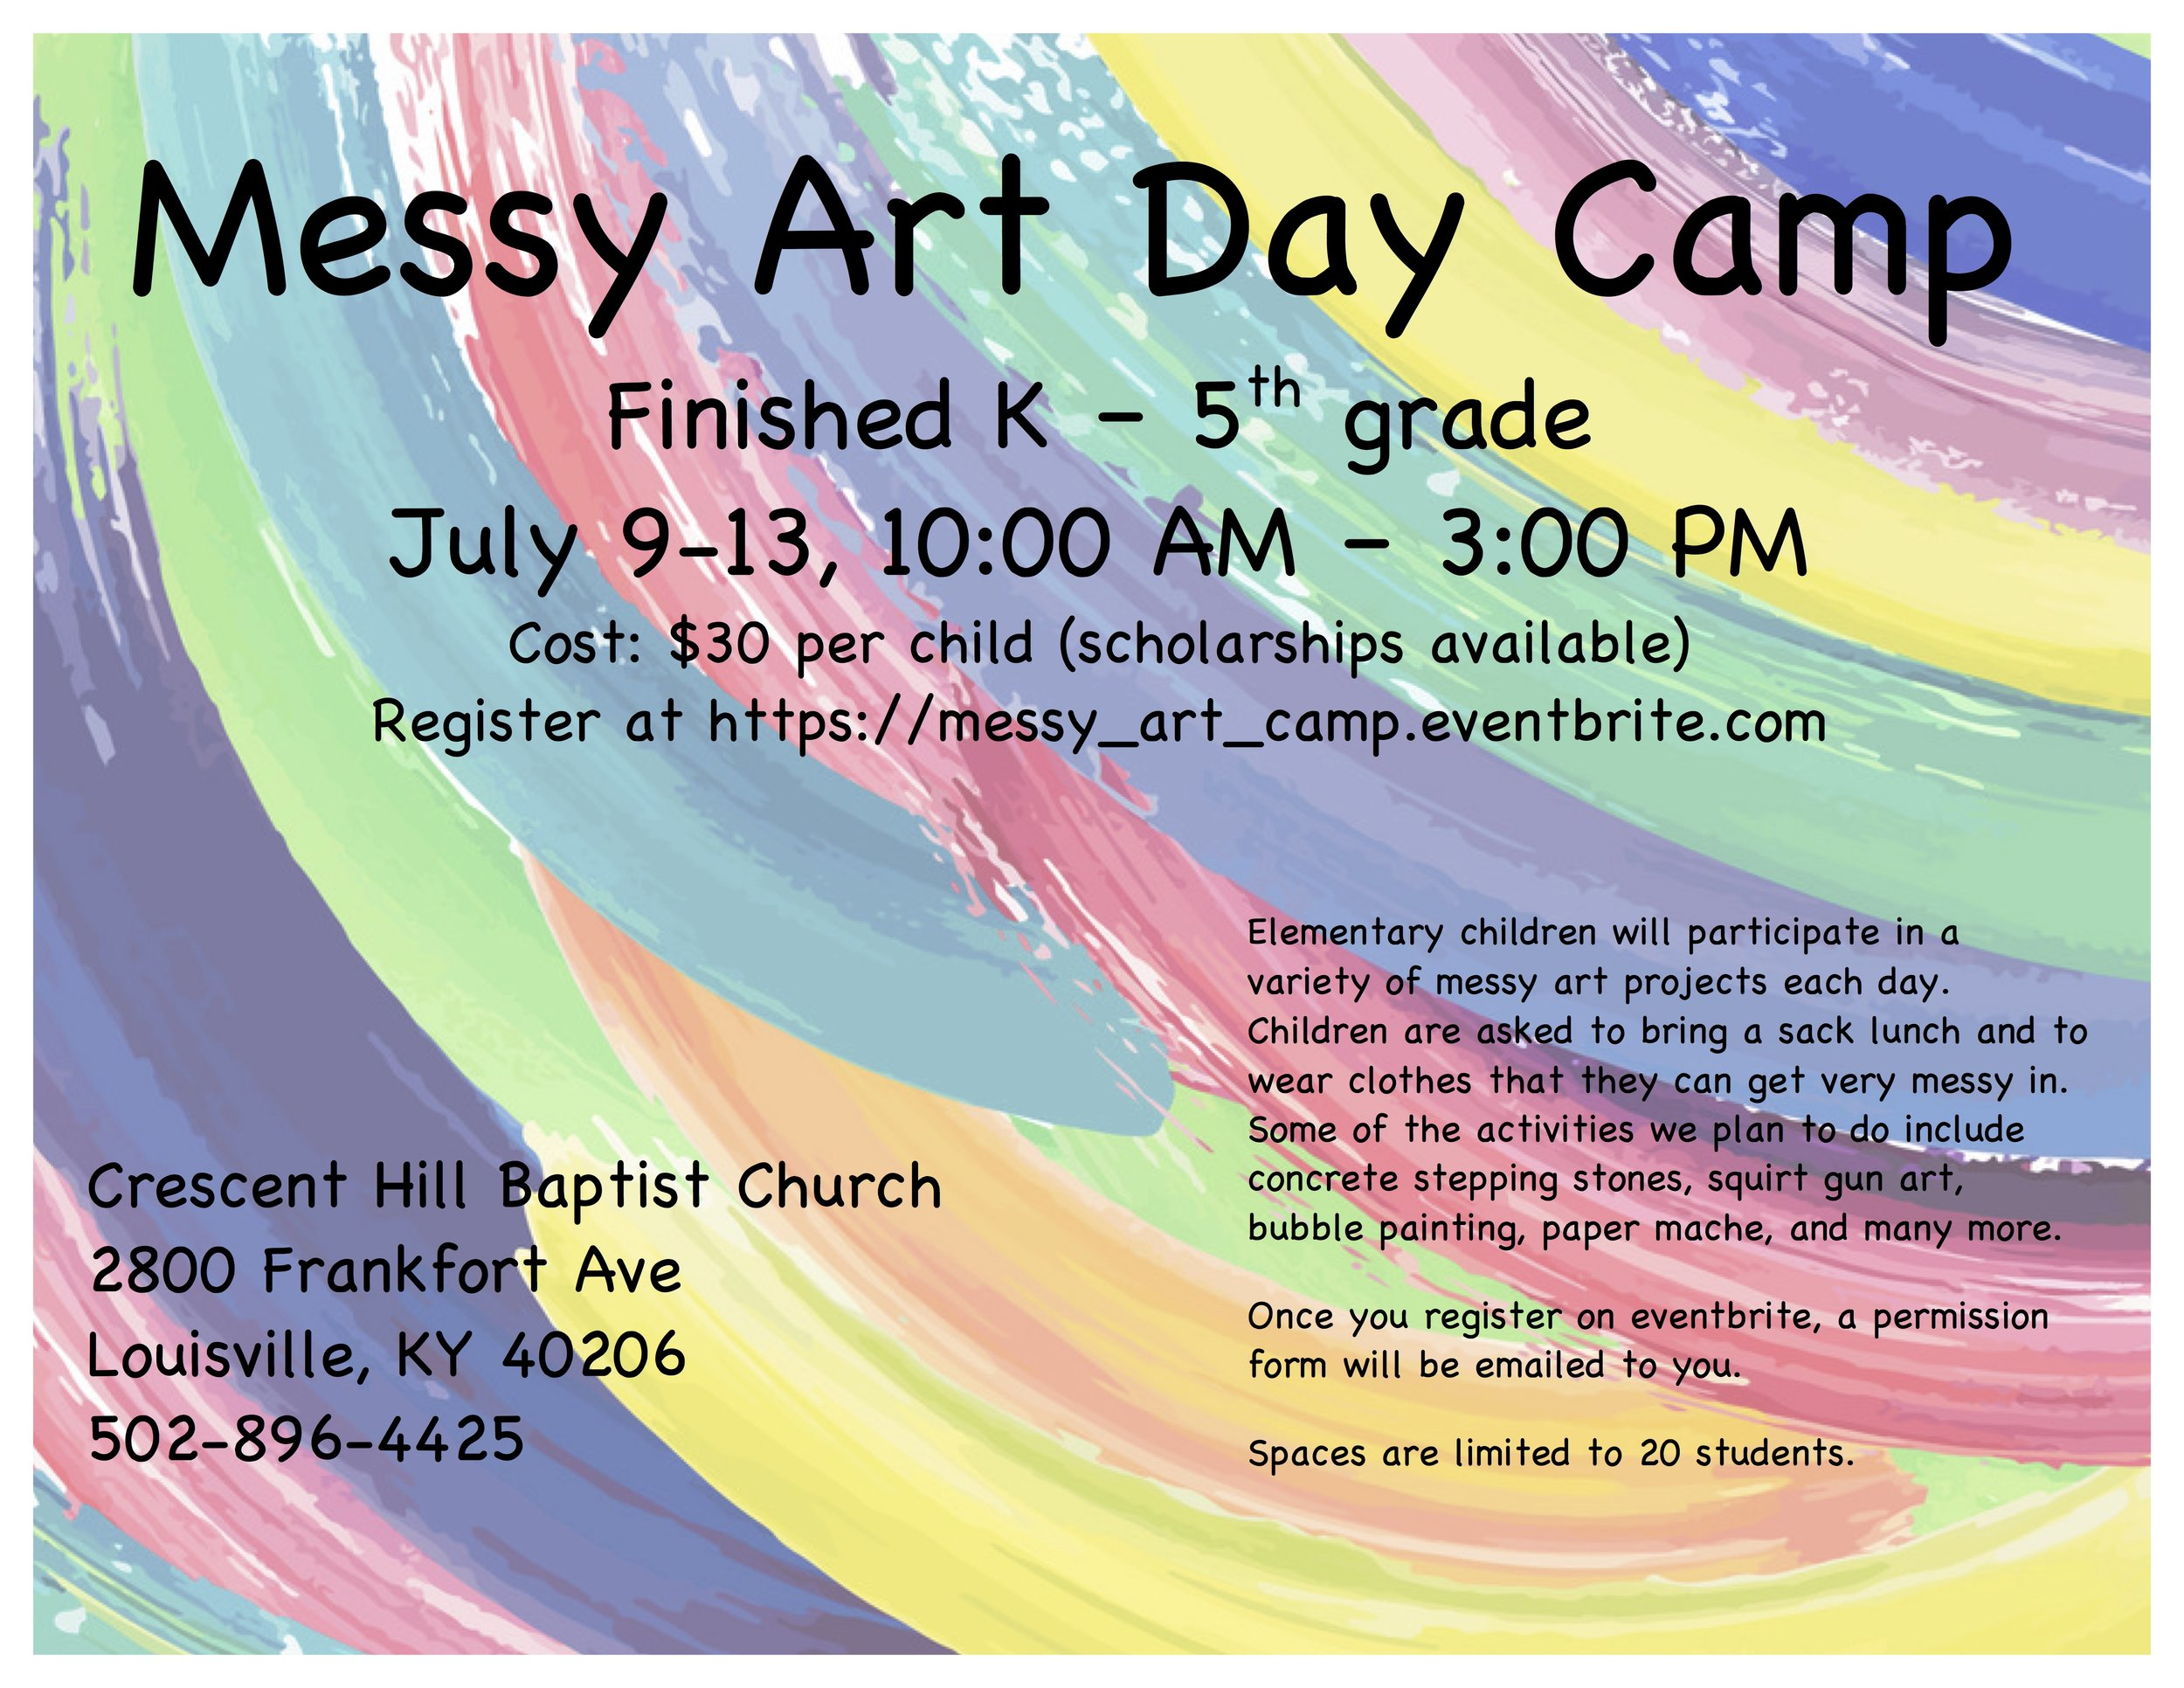 messy art camp flier.jpg